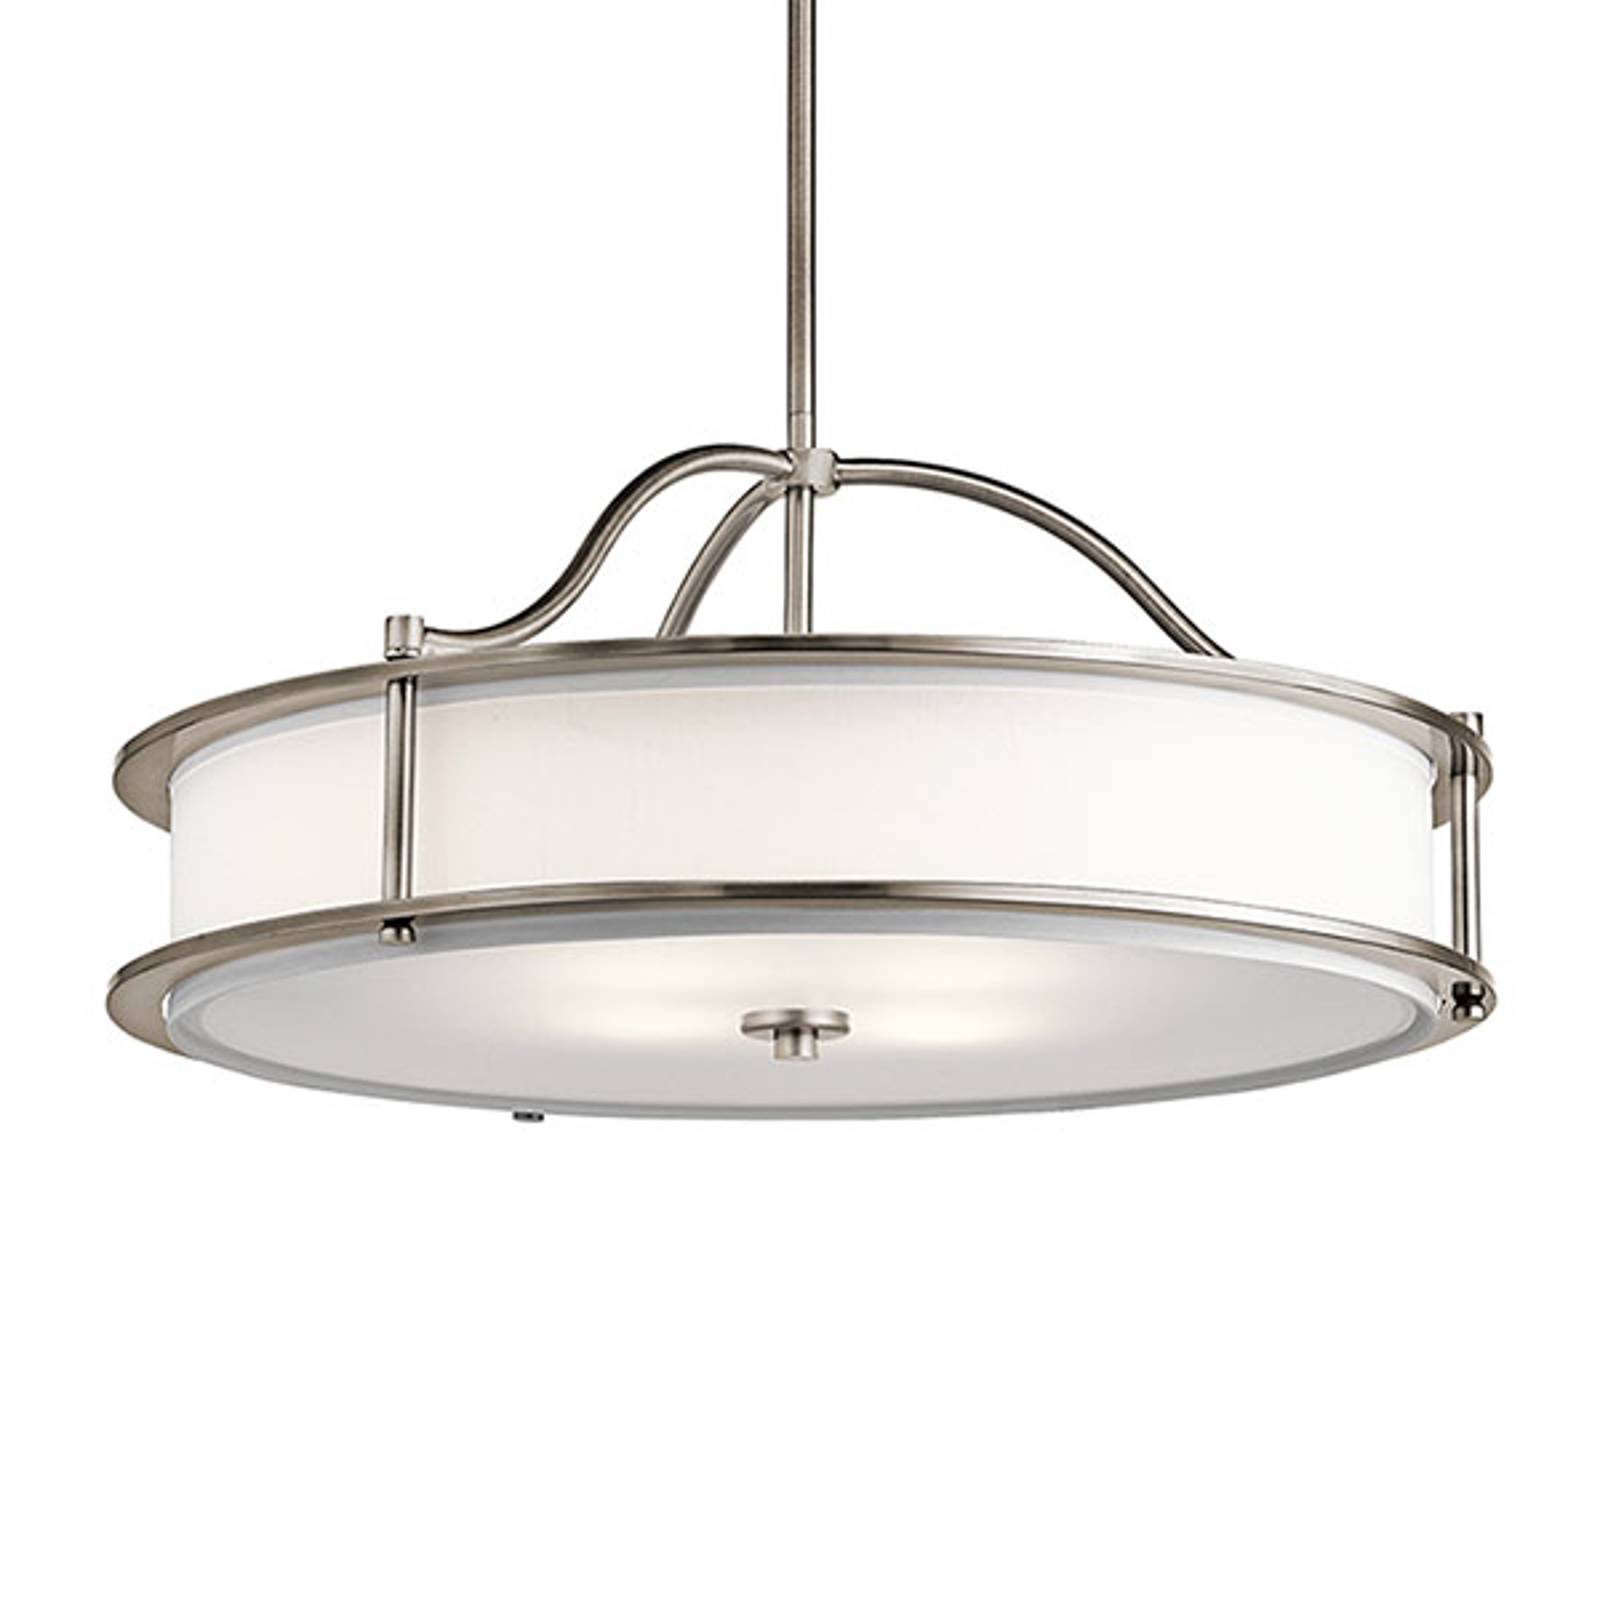 Hanglamp Emory vertind Ø 61 cm